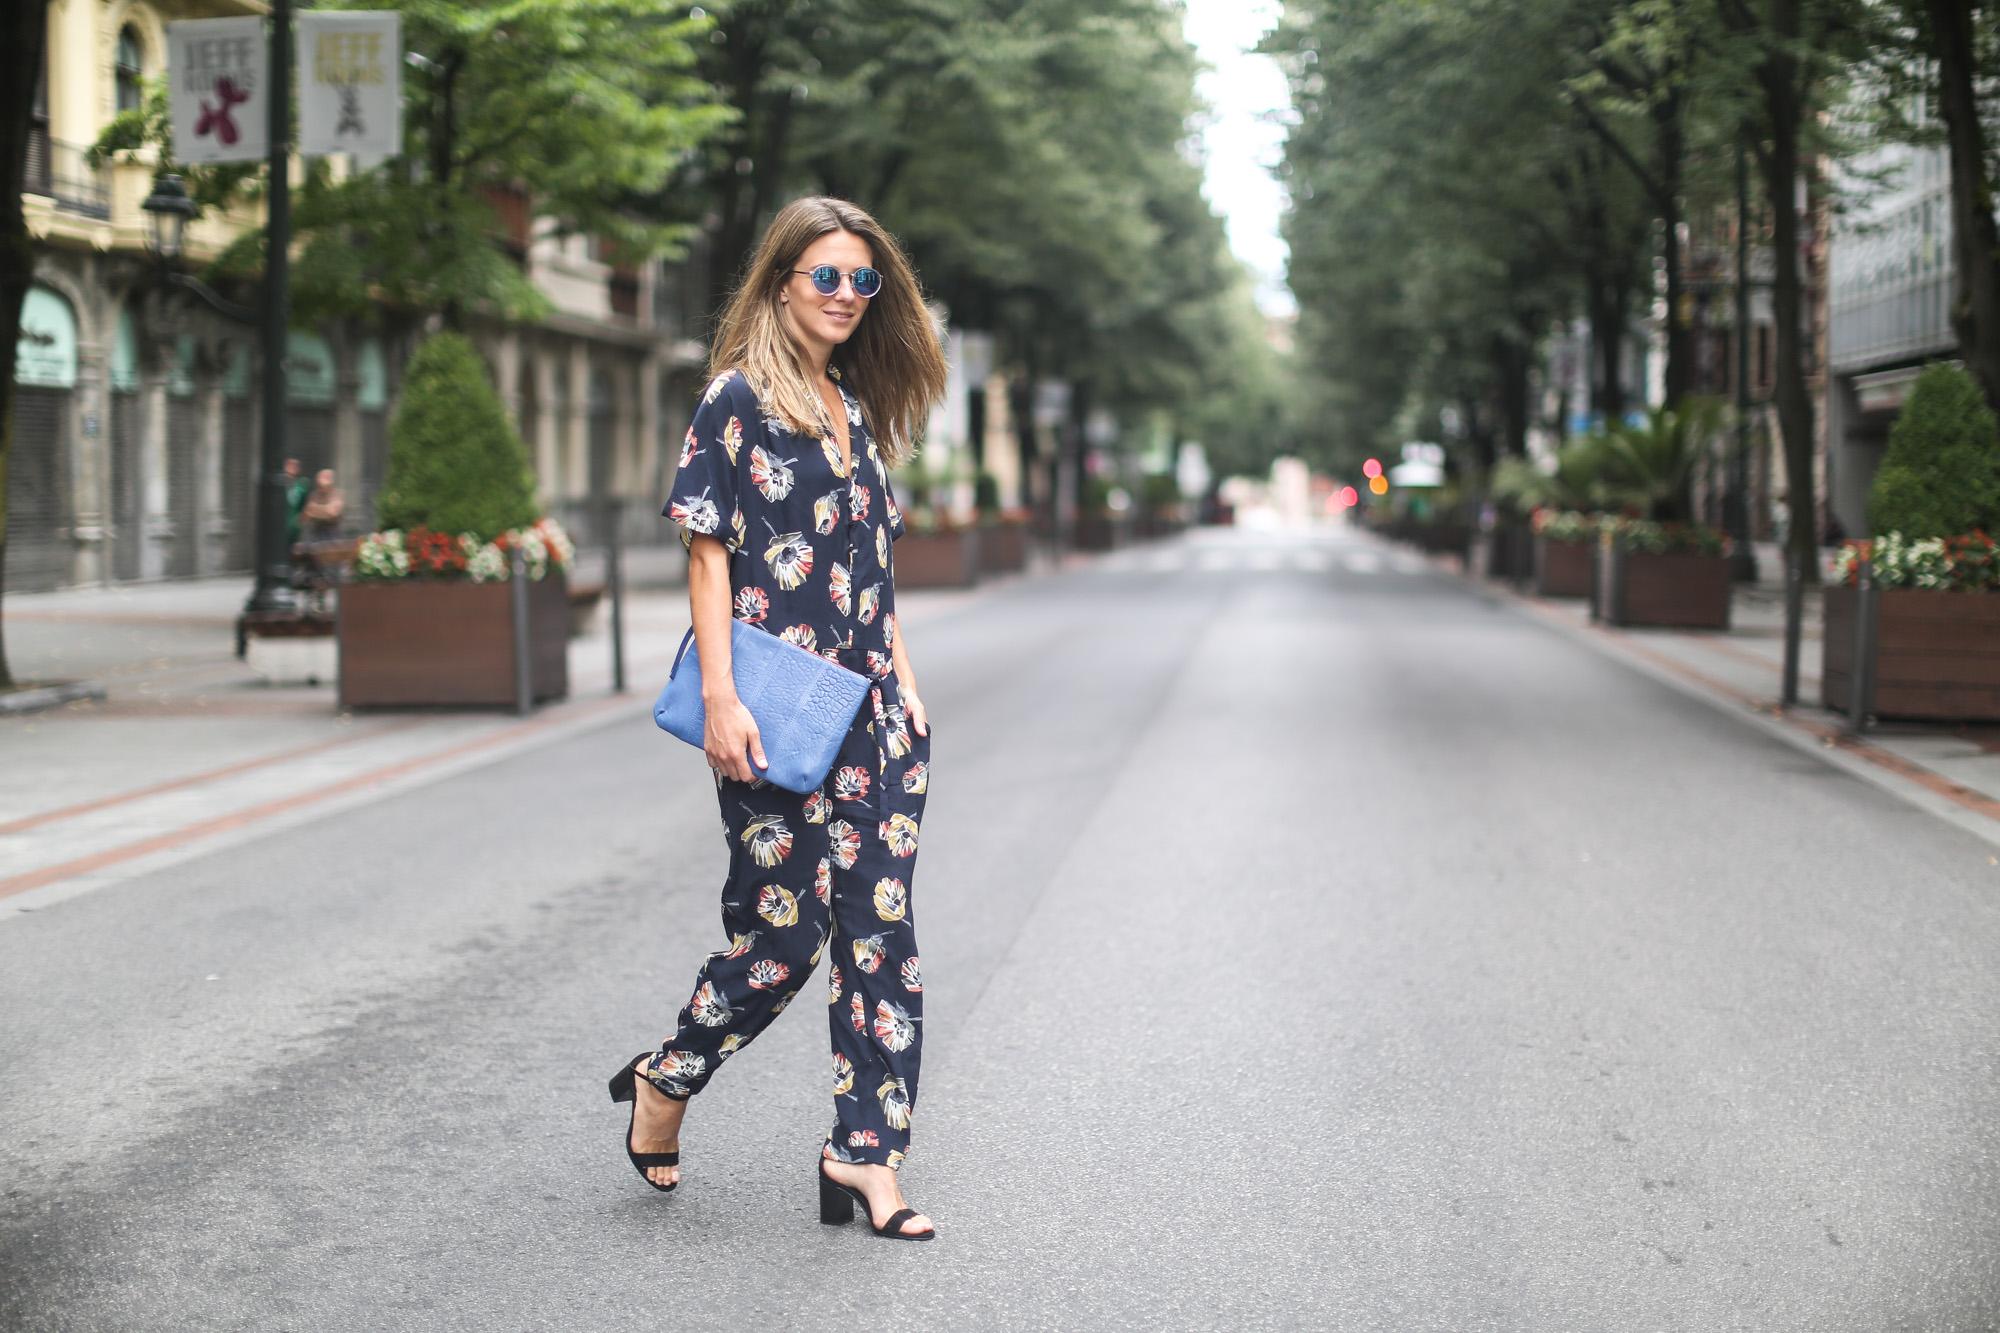 Clochet_streetstyle_zara_floral_jumpsuit_artemisia_leather_clutch-6